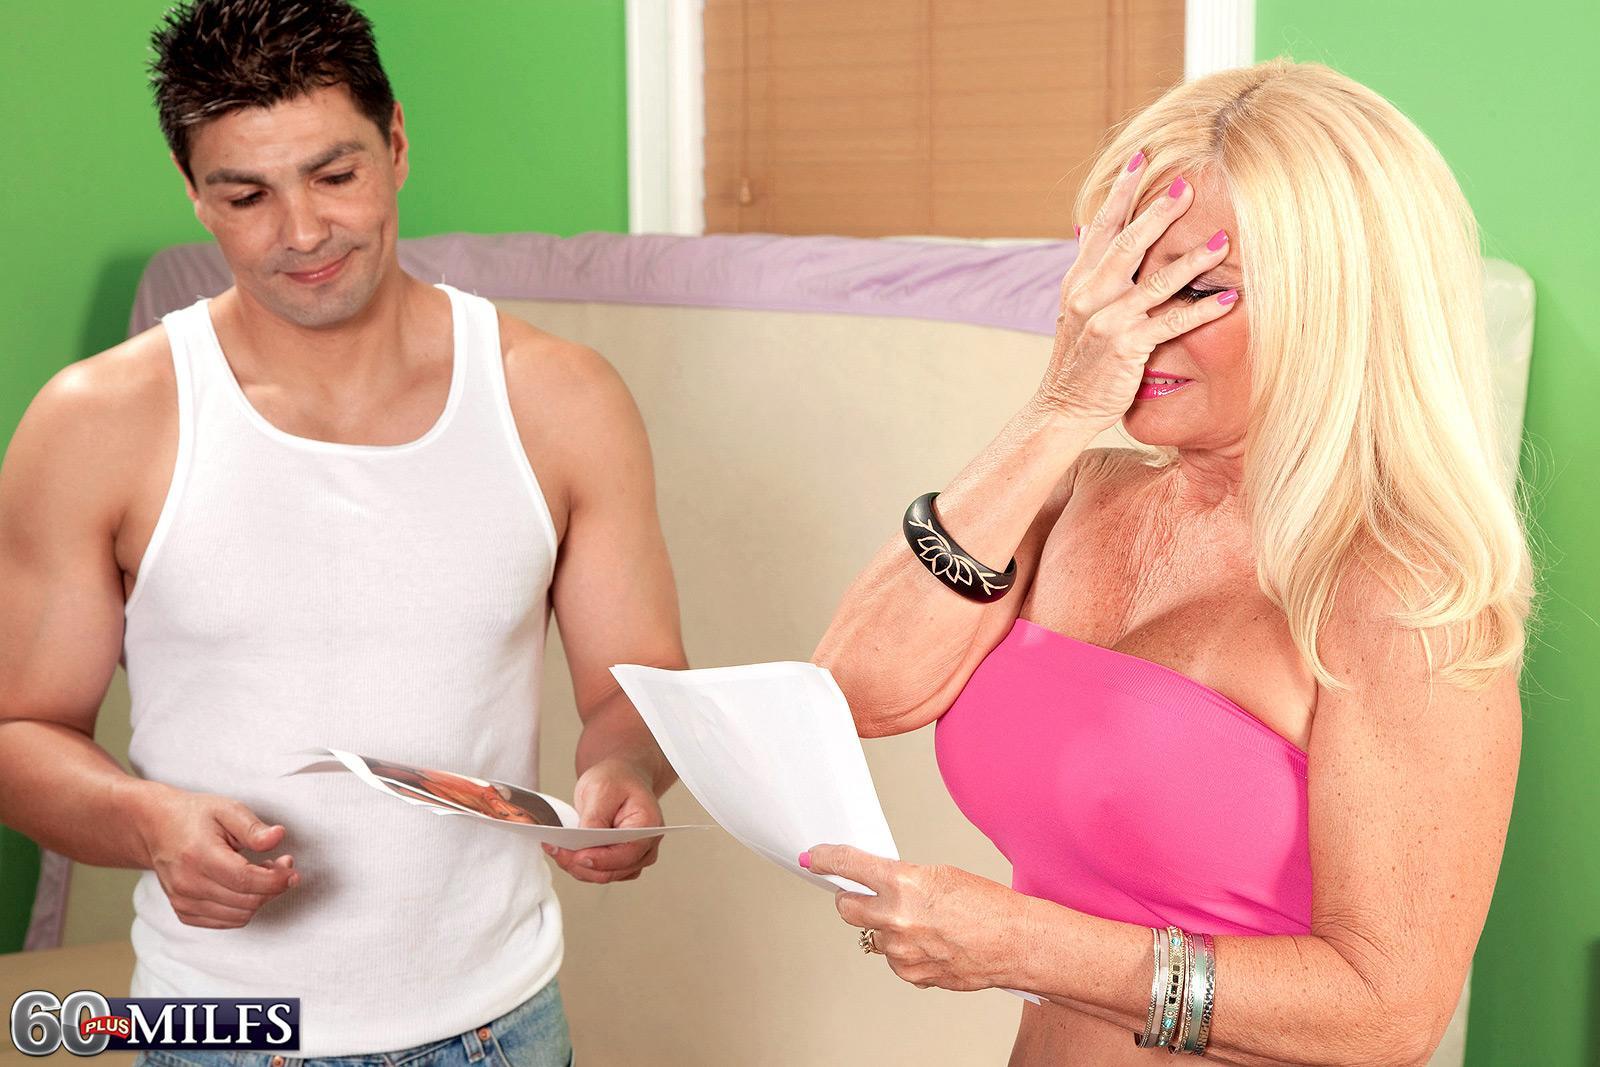 Blond grandma Julia Derriere uncovering adorable boobs in denim jeans before interracial MMF threeway